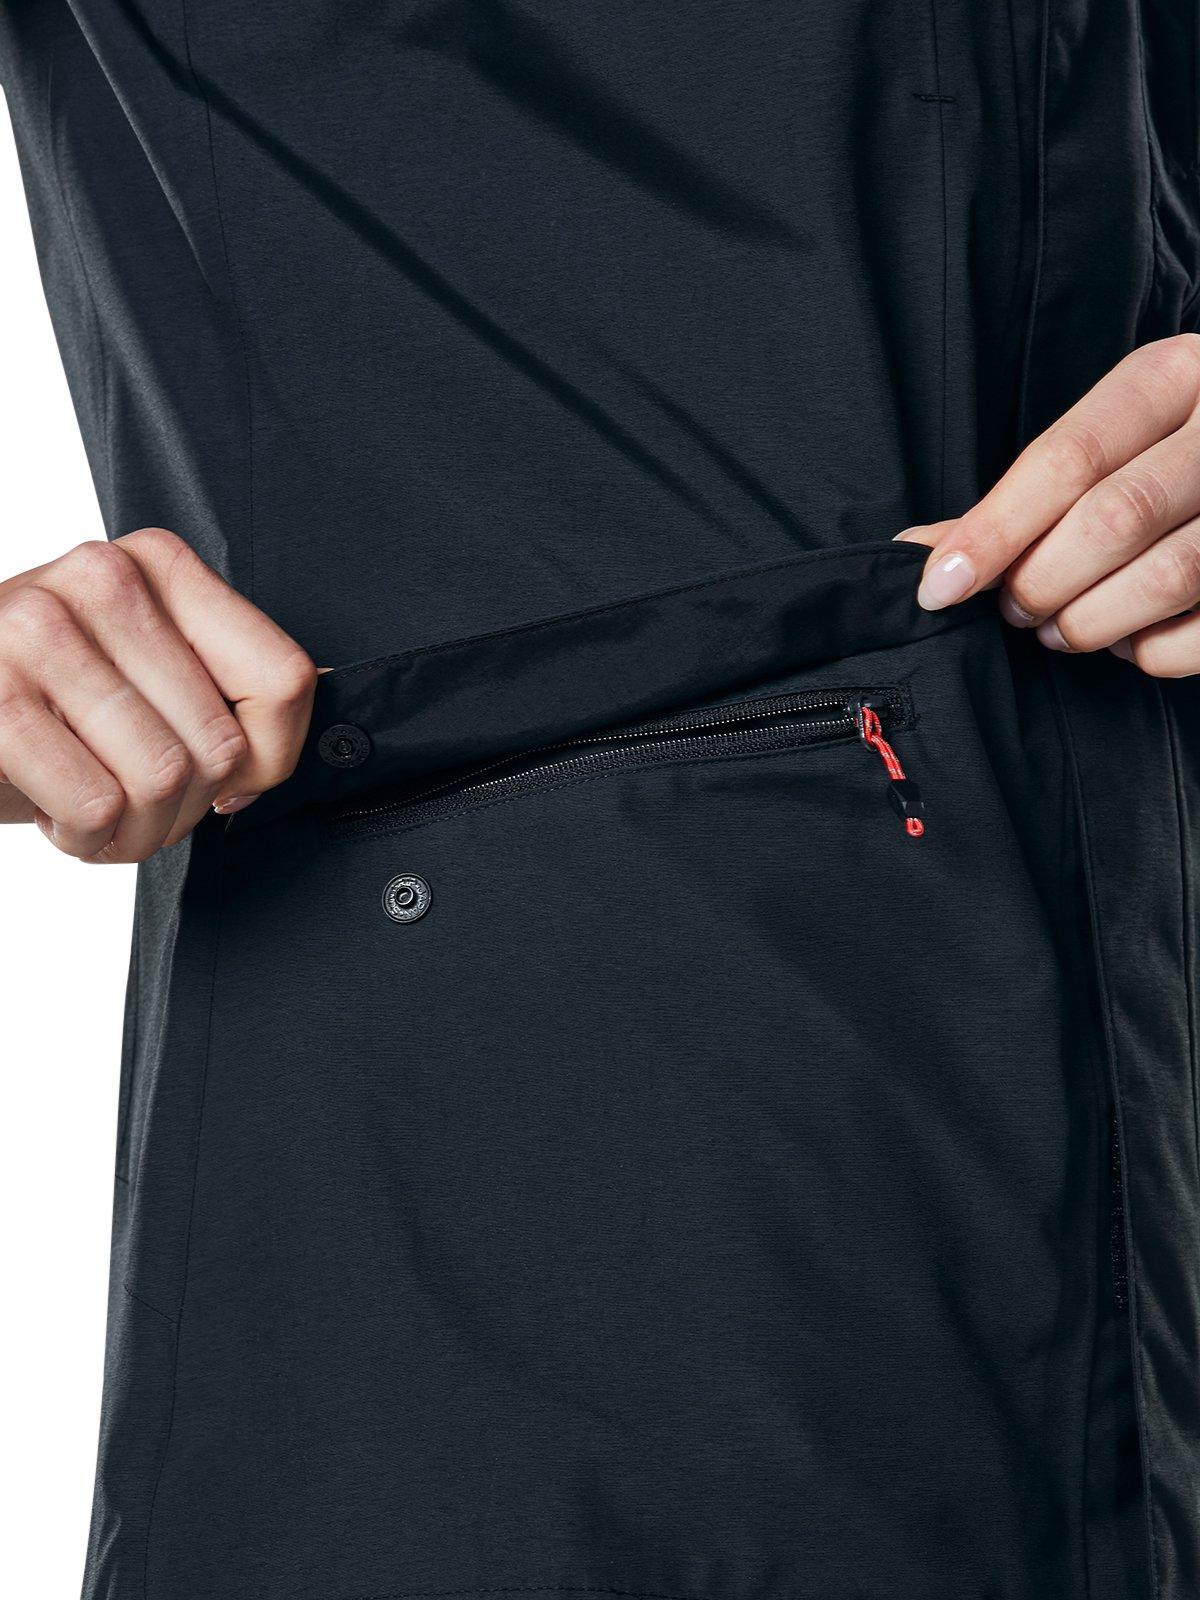 81vrfXsxHgL - Berghaus Women's Hillmaster Gore-tex Waterproof Jacket